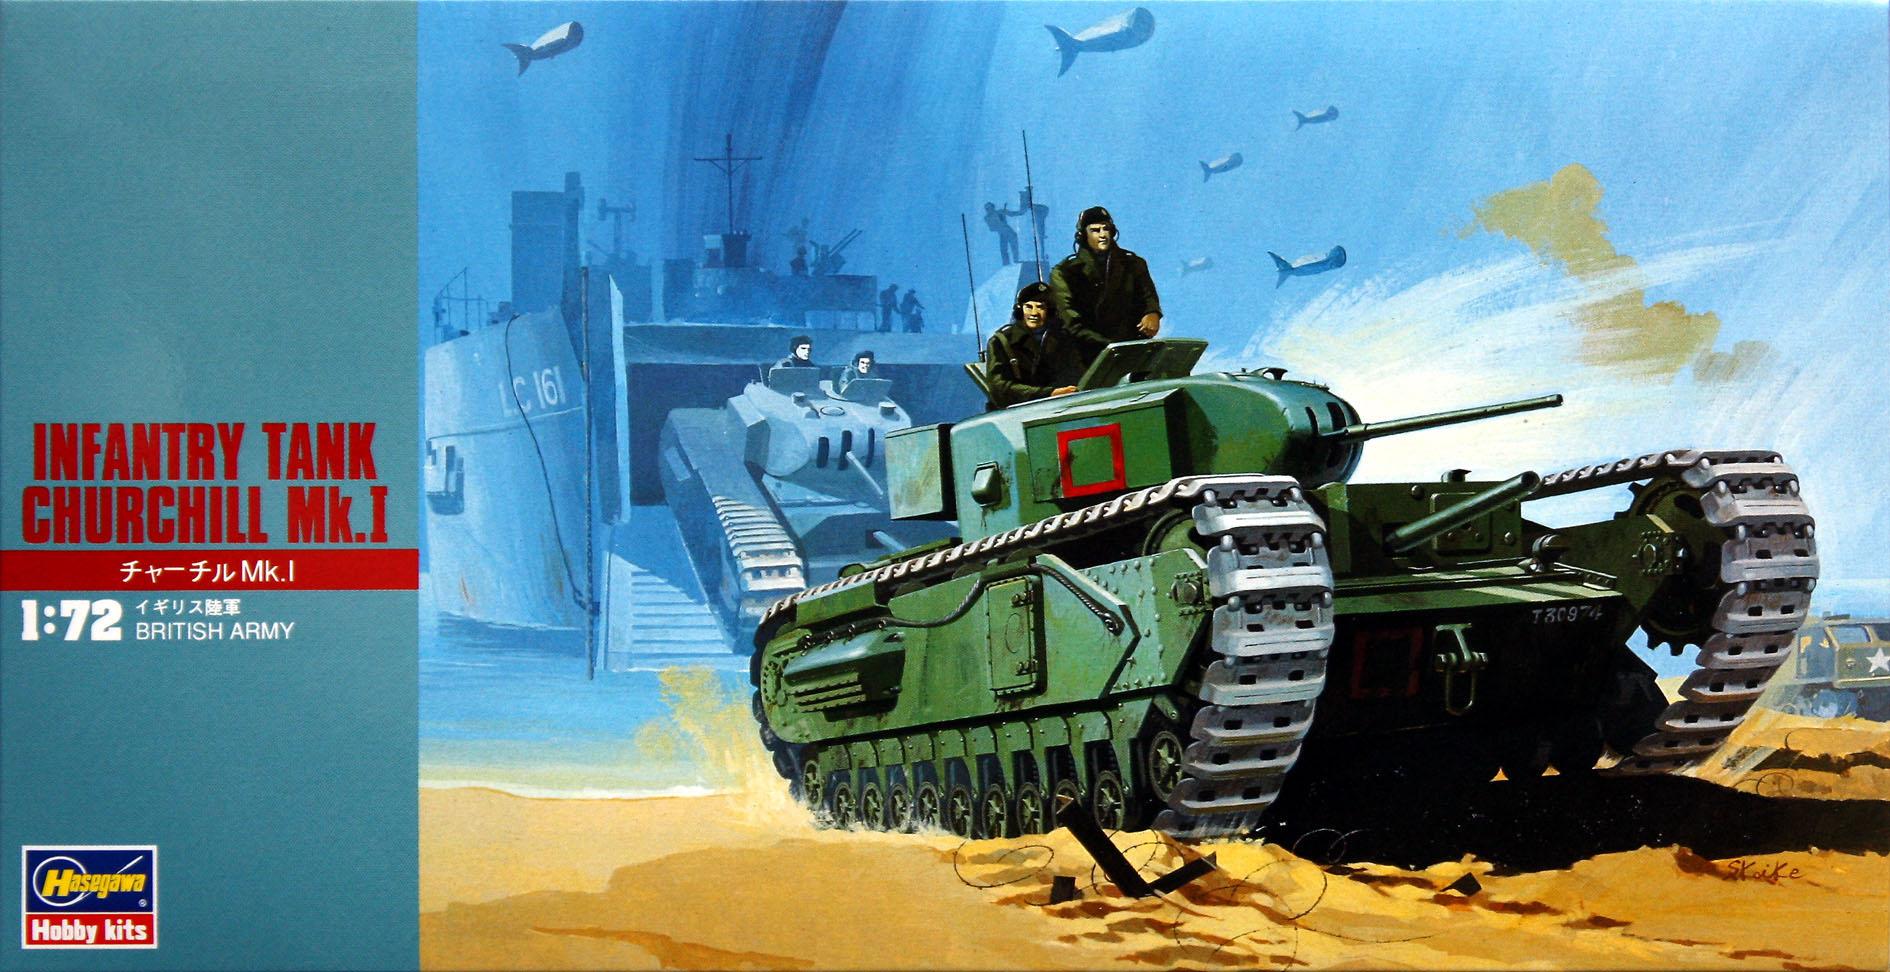 Hasegawa 1/72 Infantry Tank Churchill Mk.I